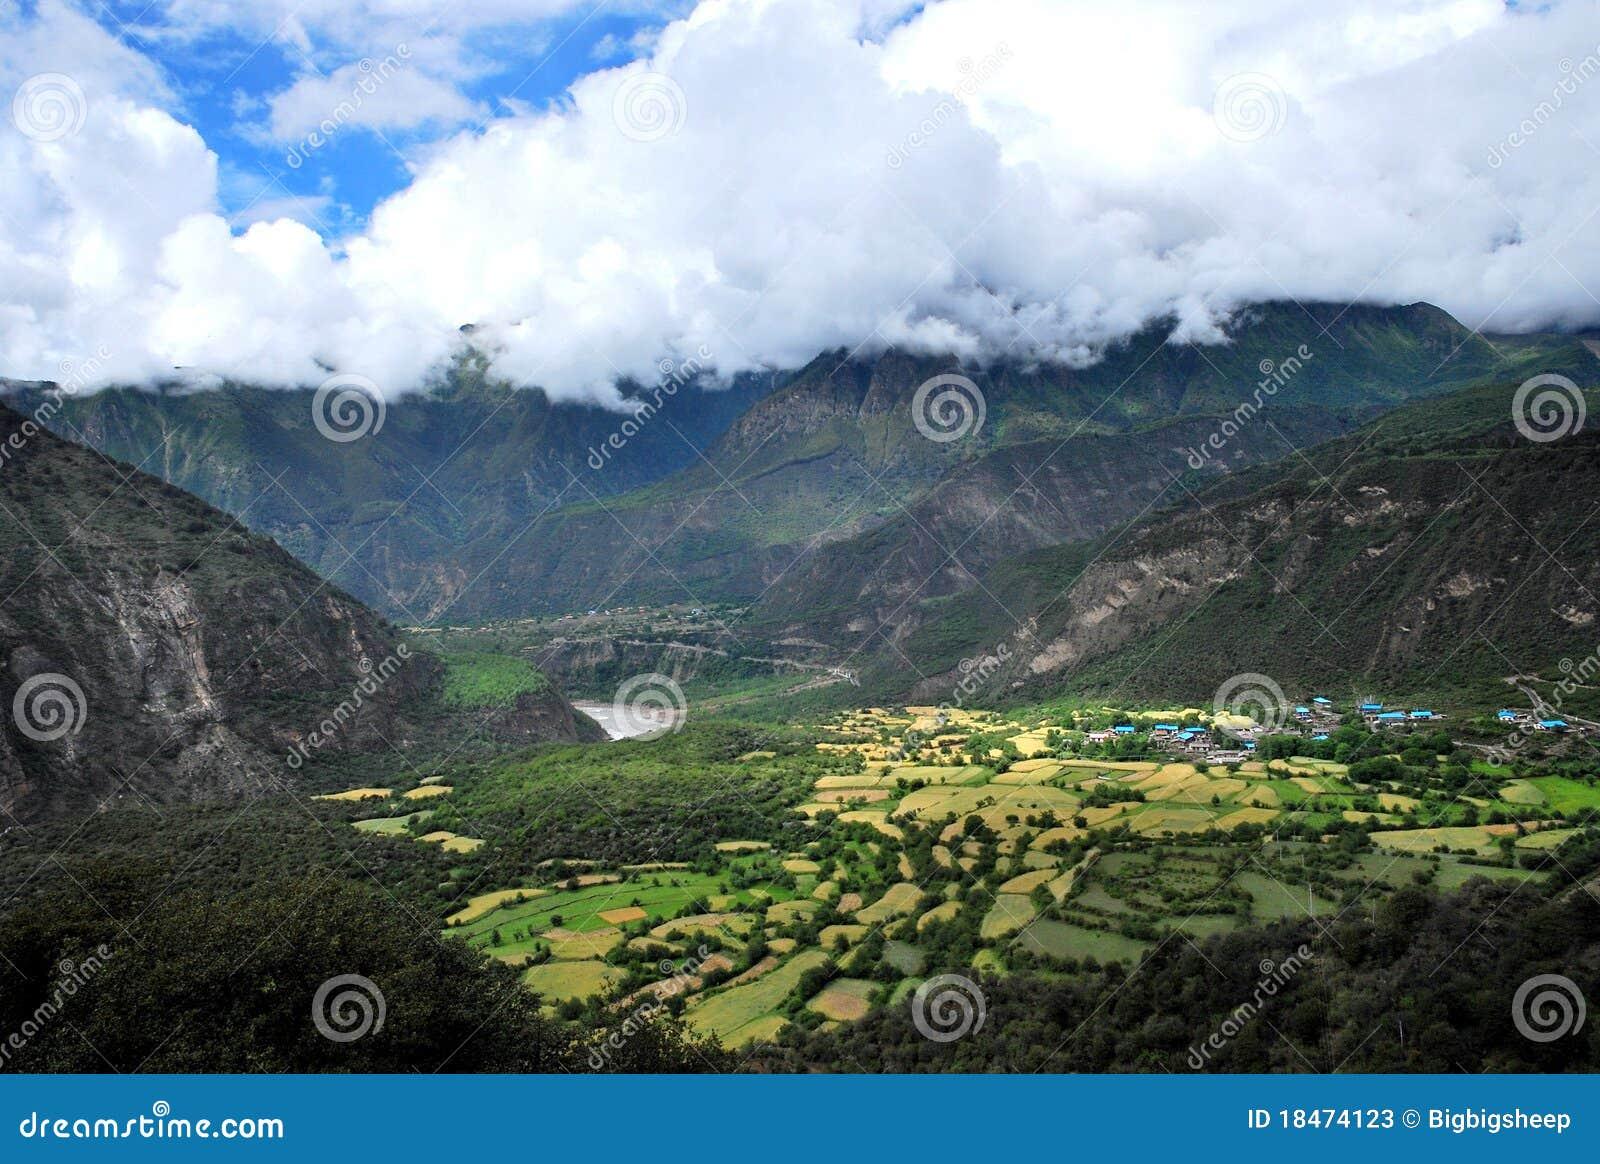 Una aldea minúscula en Tíbet